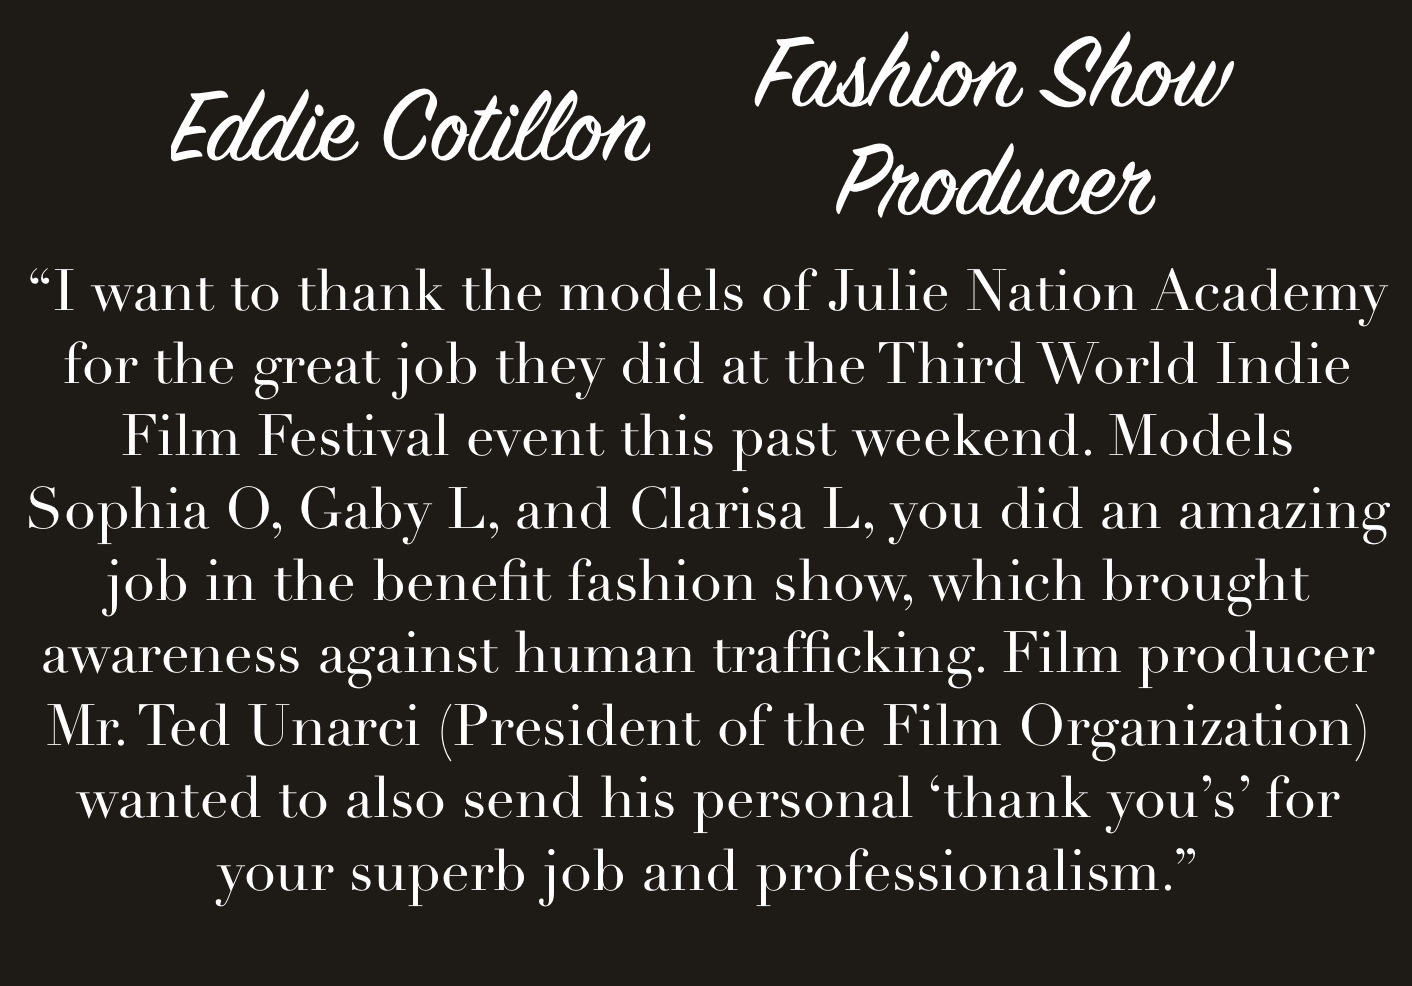 Eddie Cotillon